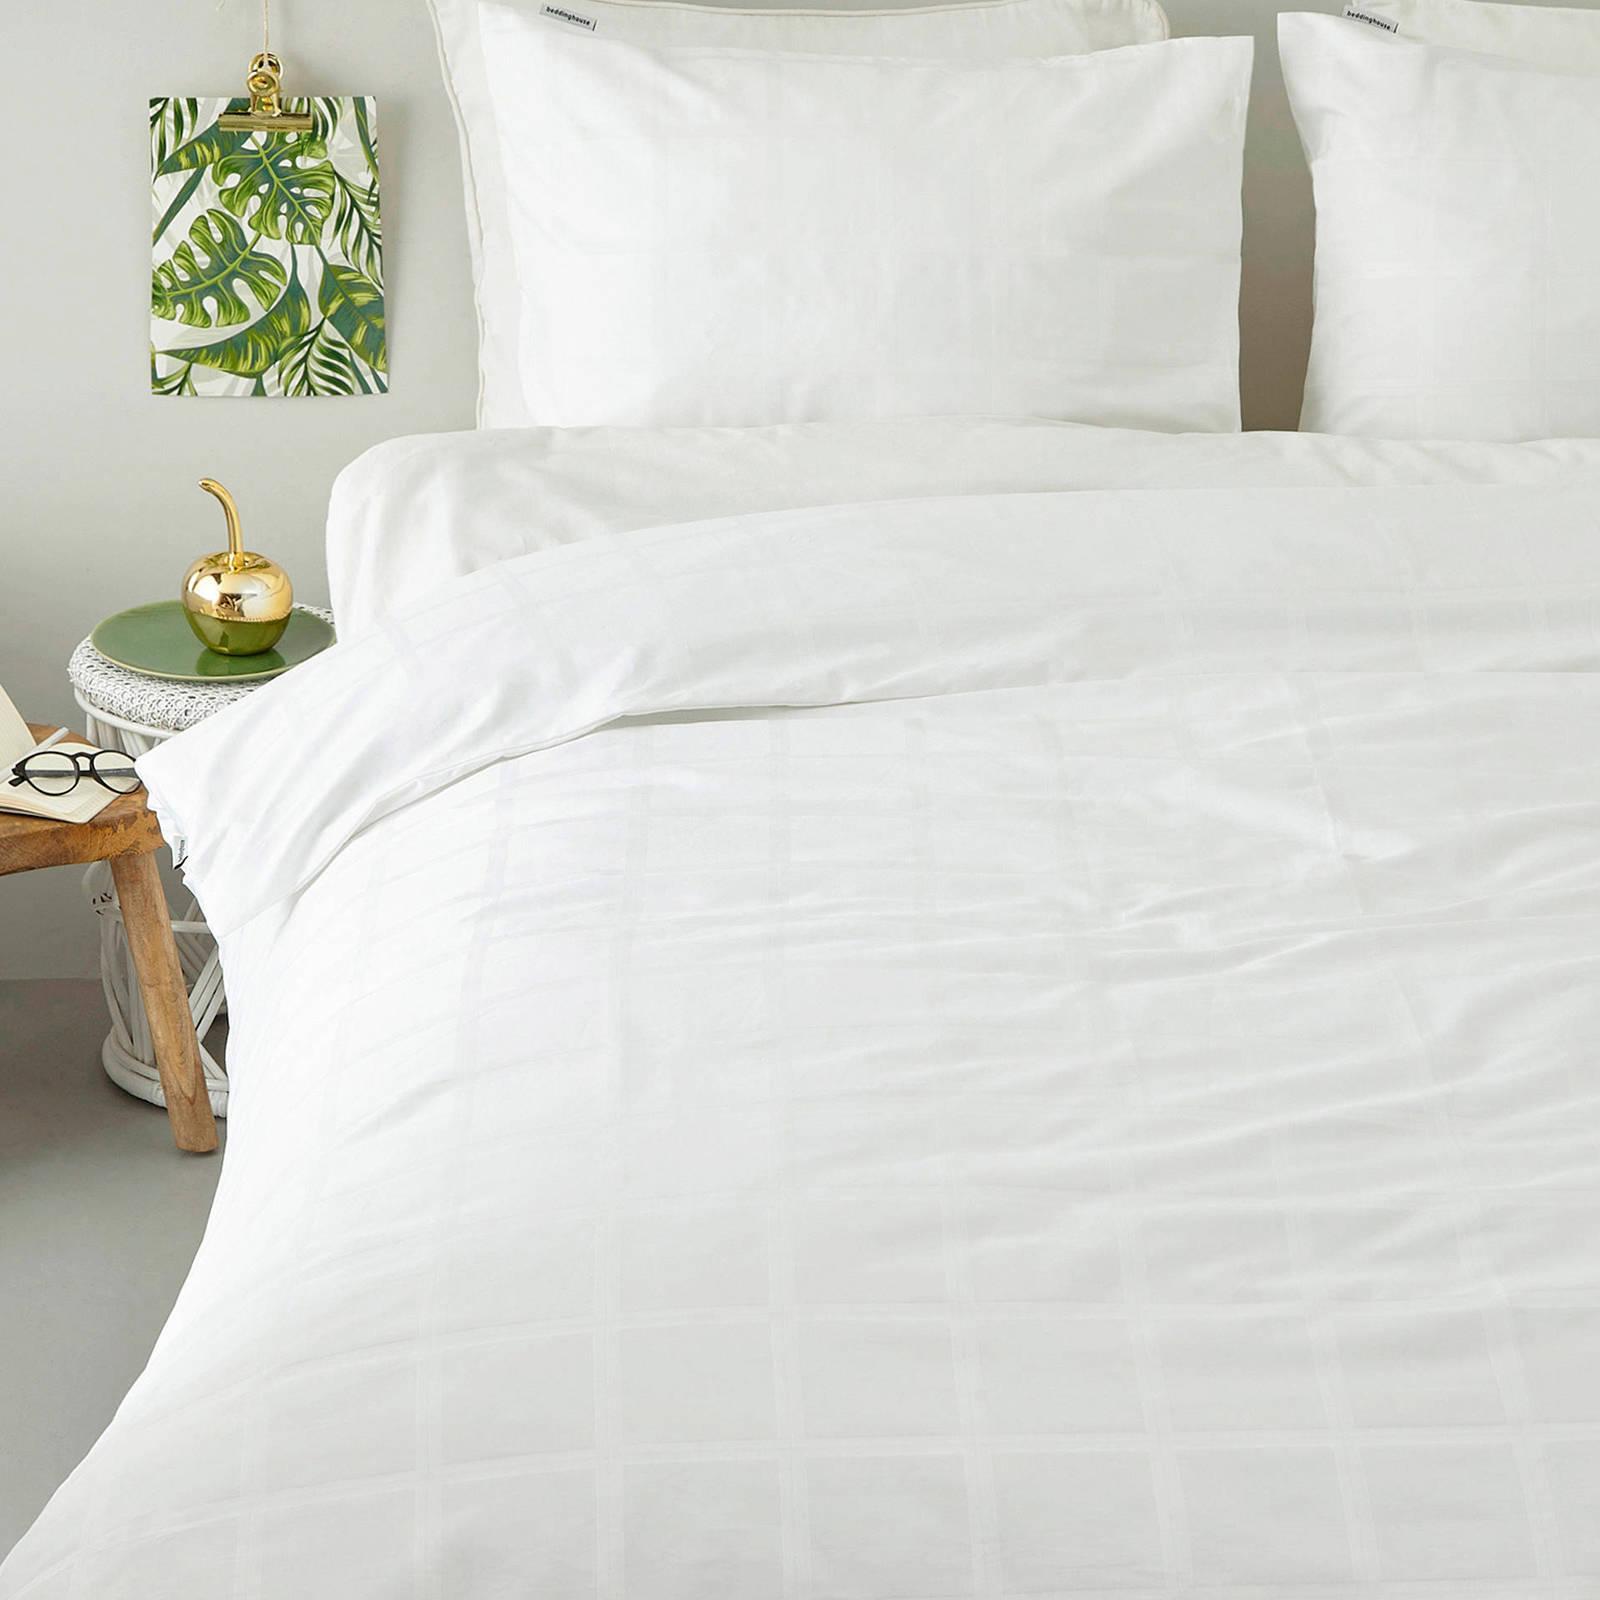 beddinghouse katoensatijnen dekbedovertrek lits jumeaux wit